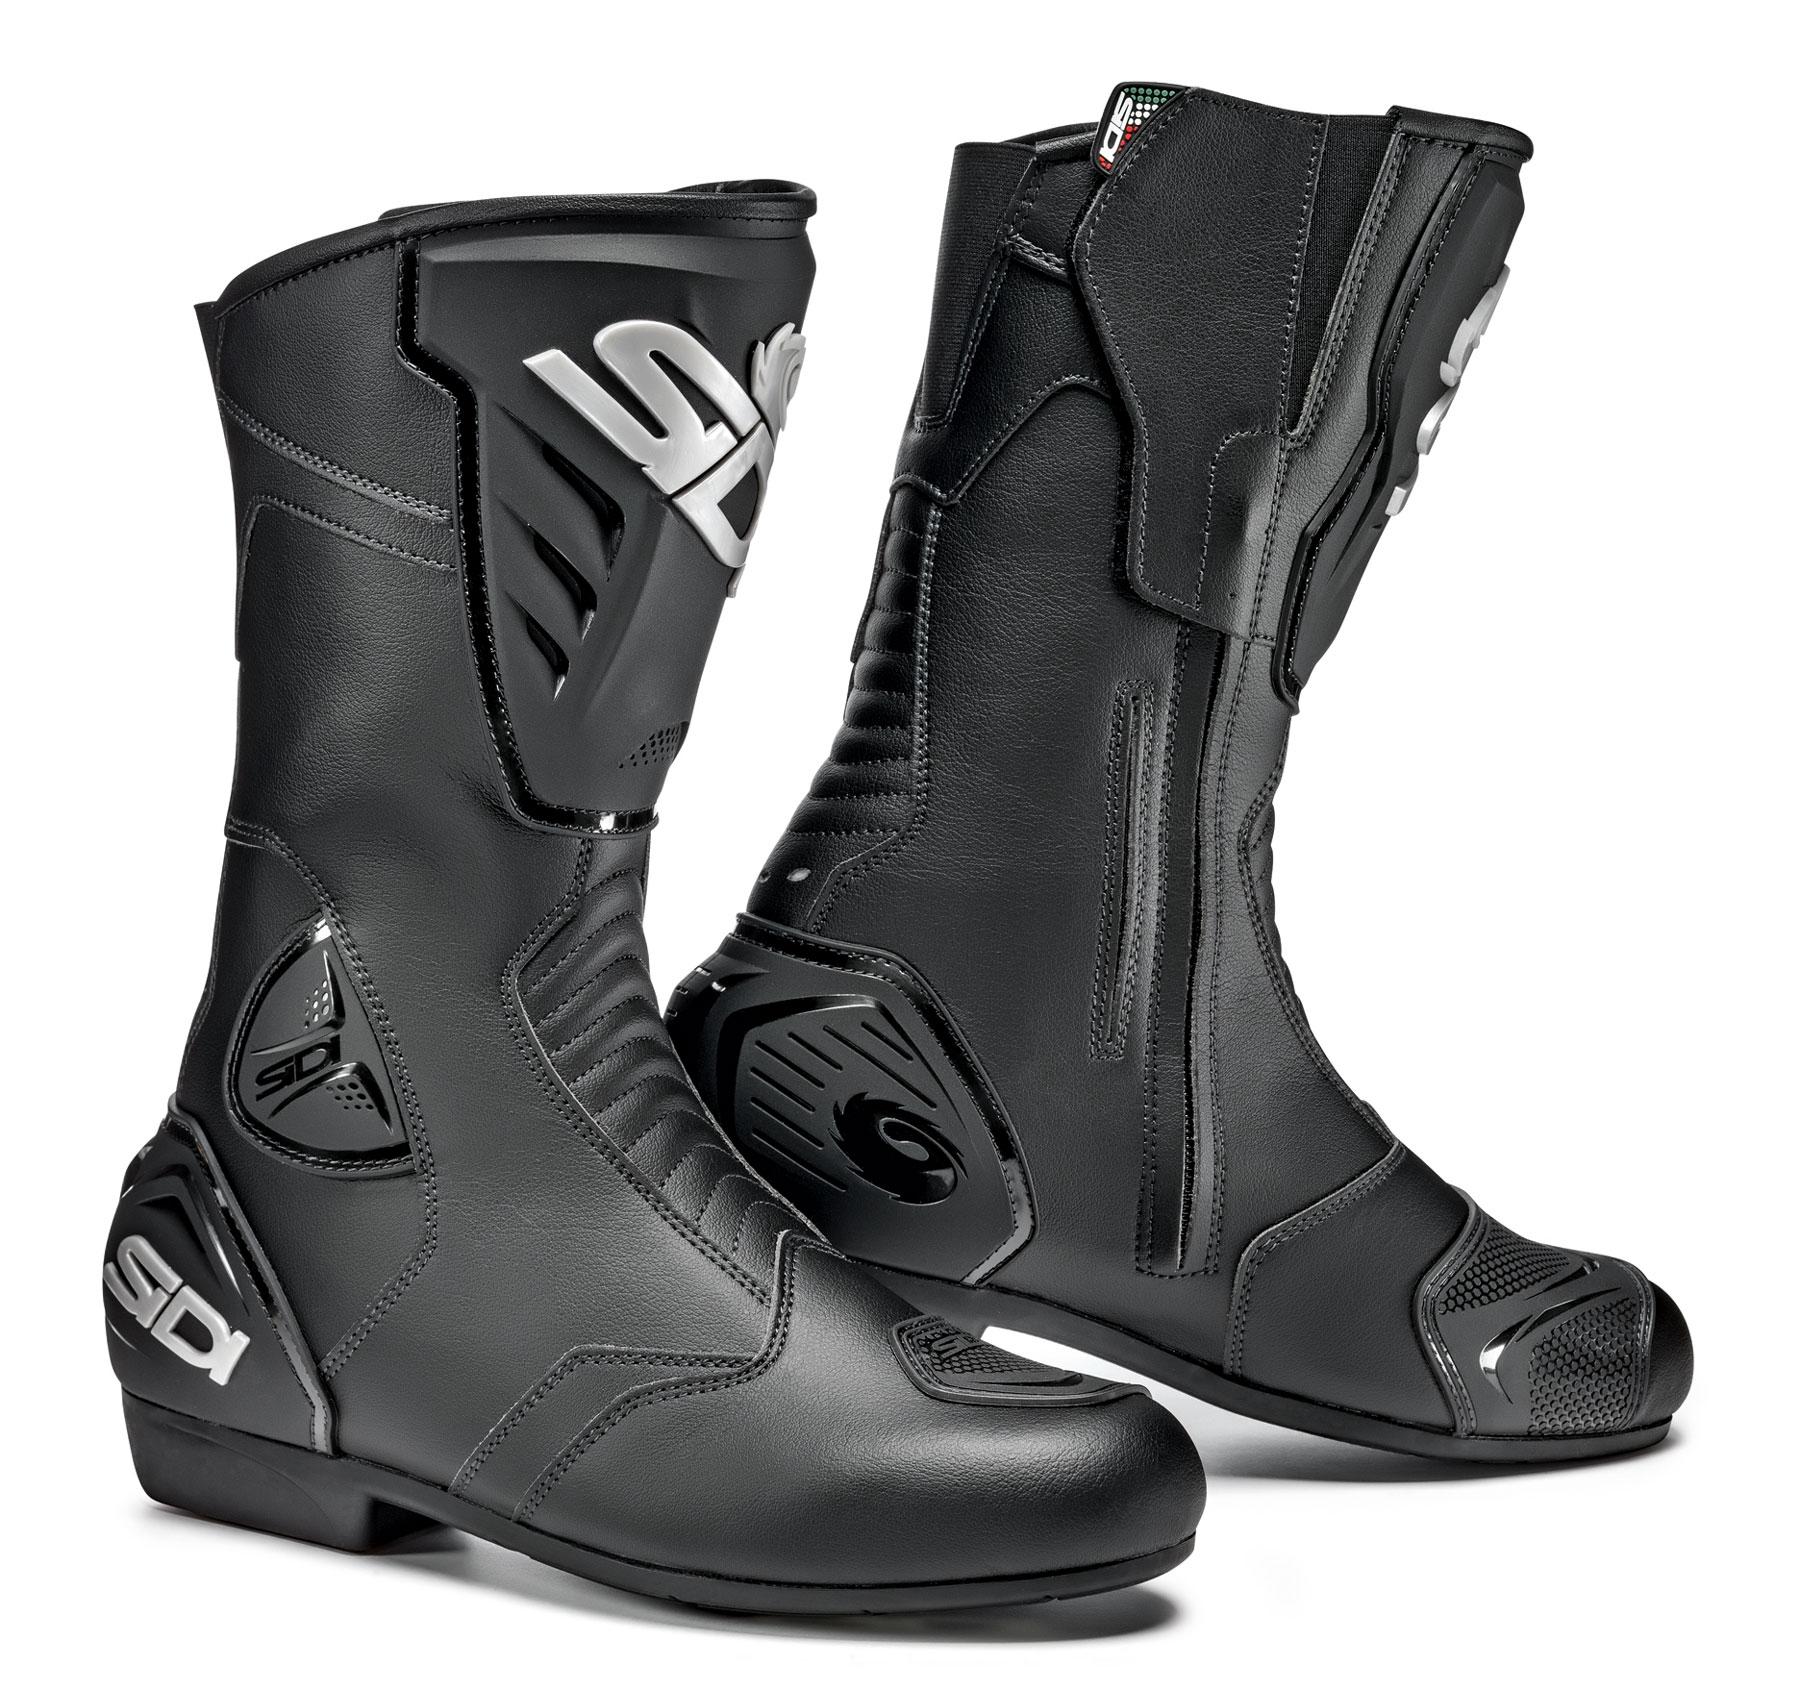 sidi black rain boots 30 free spend free uk delivery. Black Bedroom Furniture Sets. Home Design Ideas